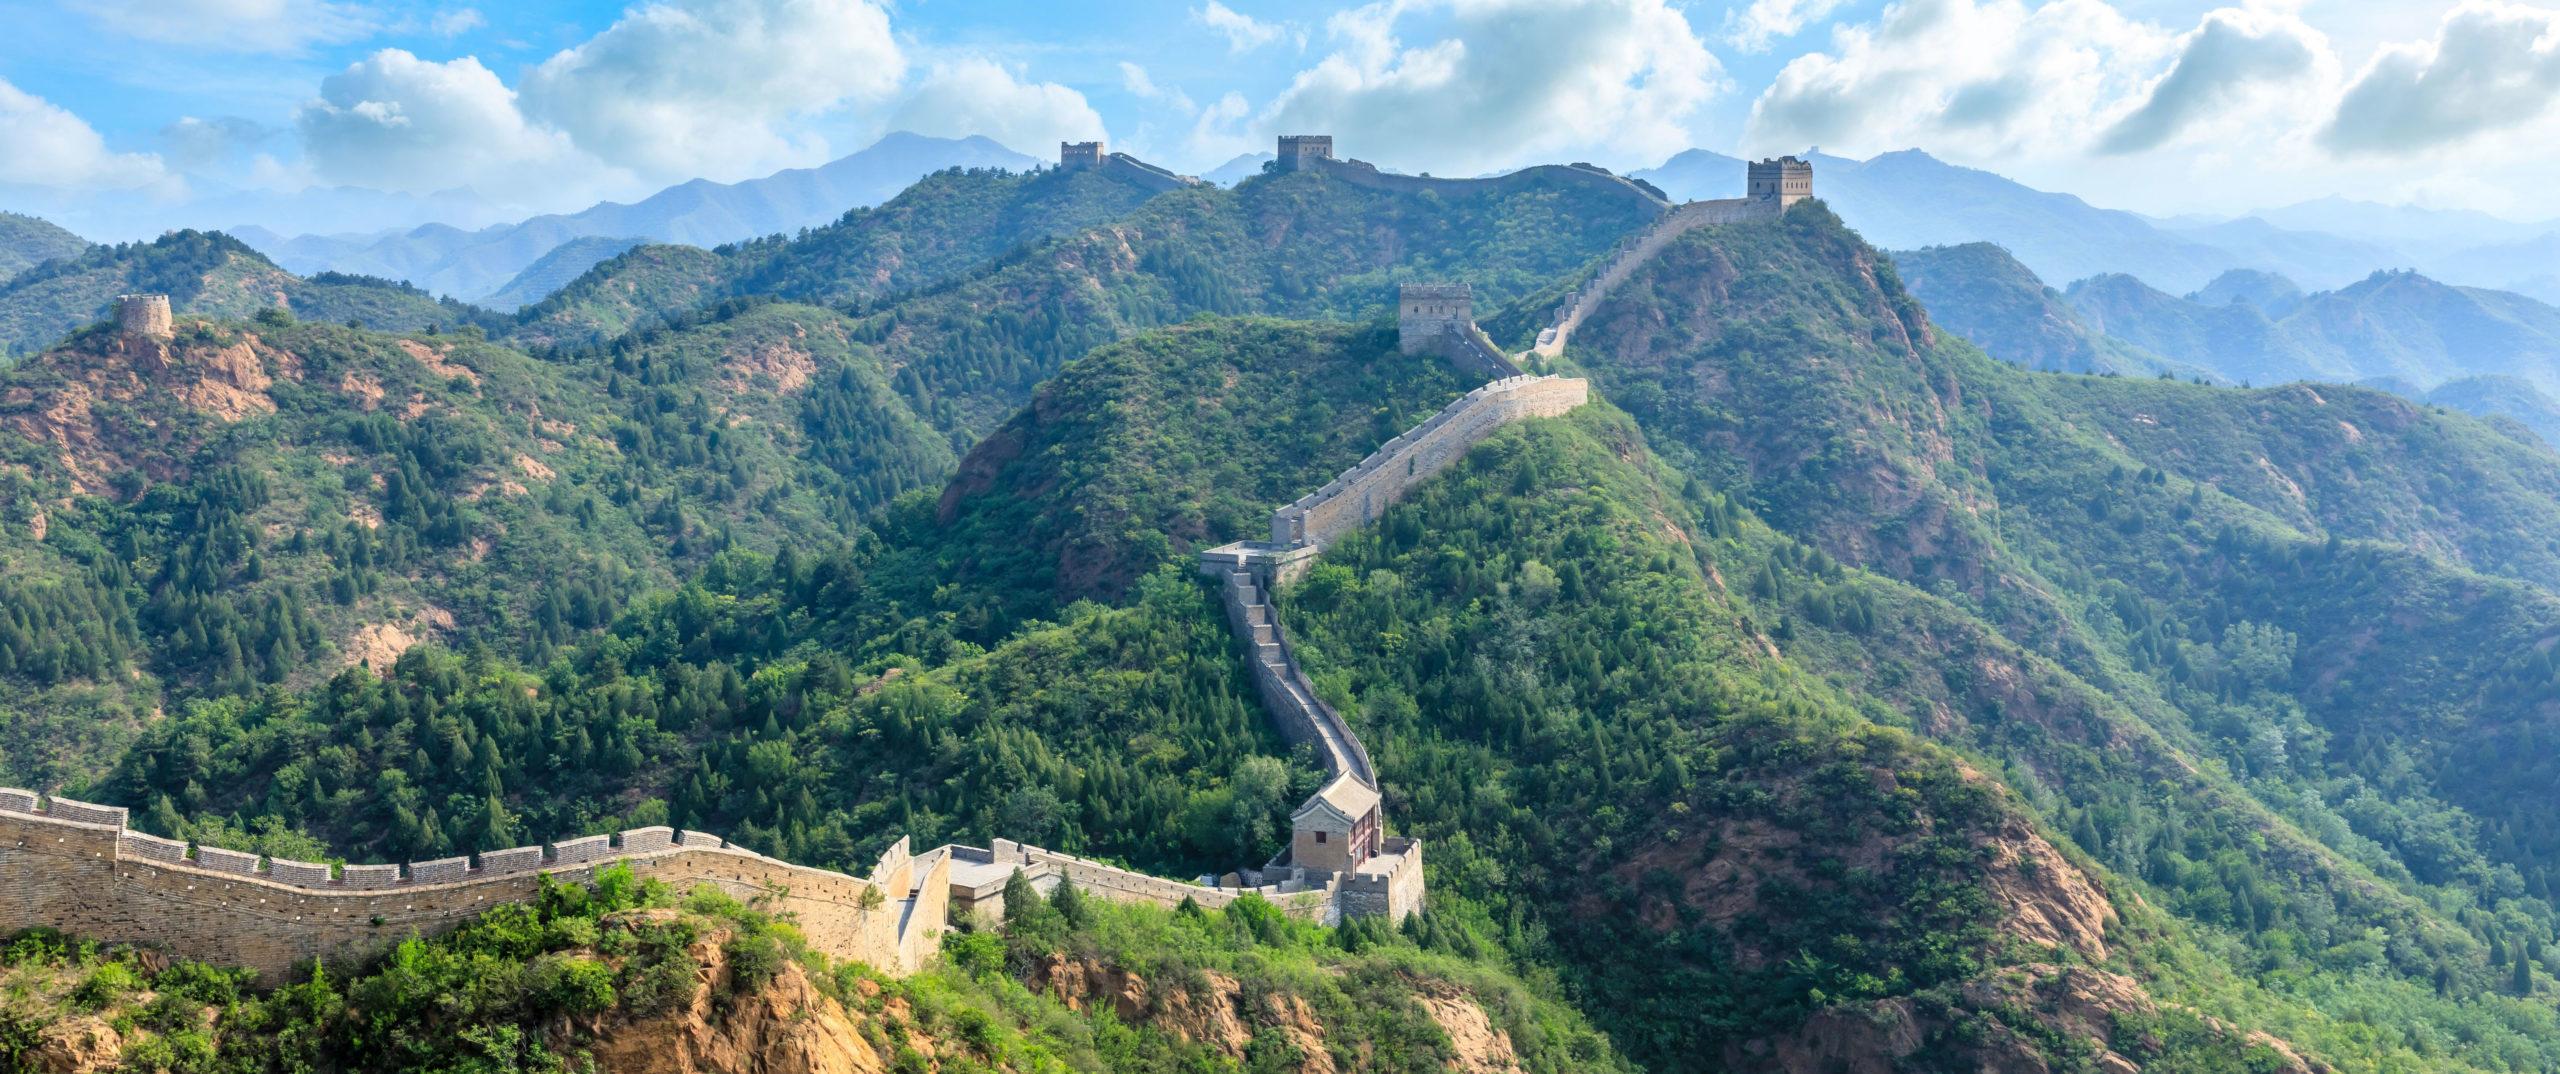 The Treasures of China